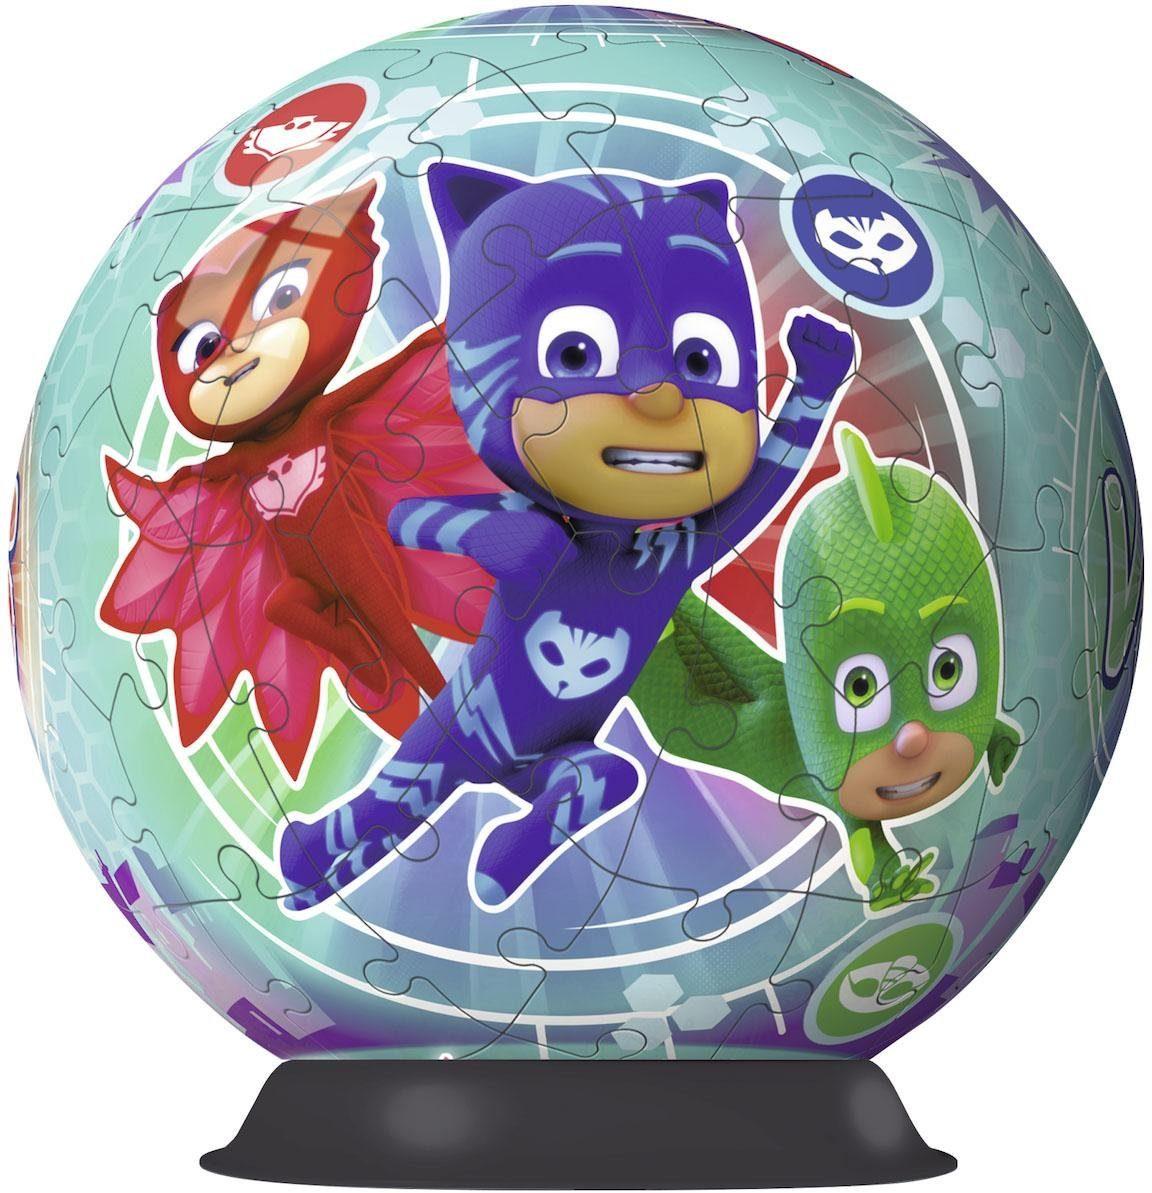 Ravensburger 3D Puzzleball , 72 Teile, »PJ Masks«